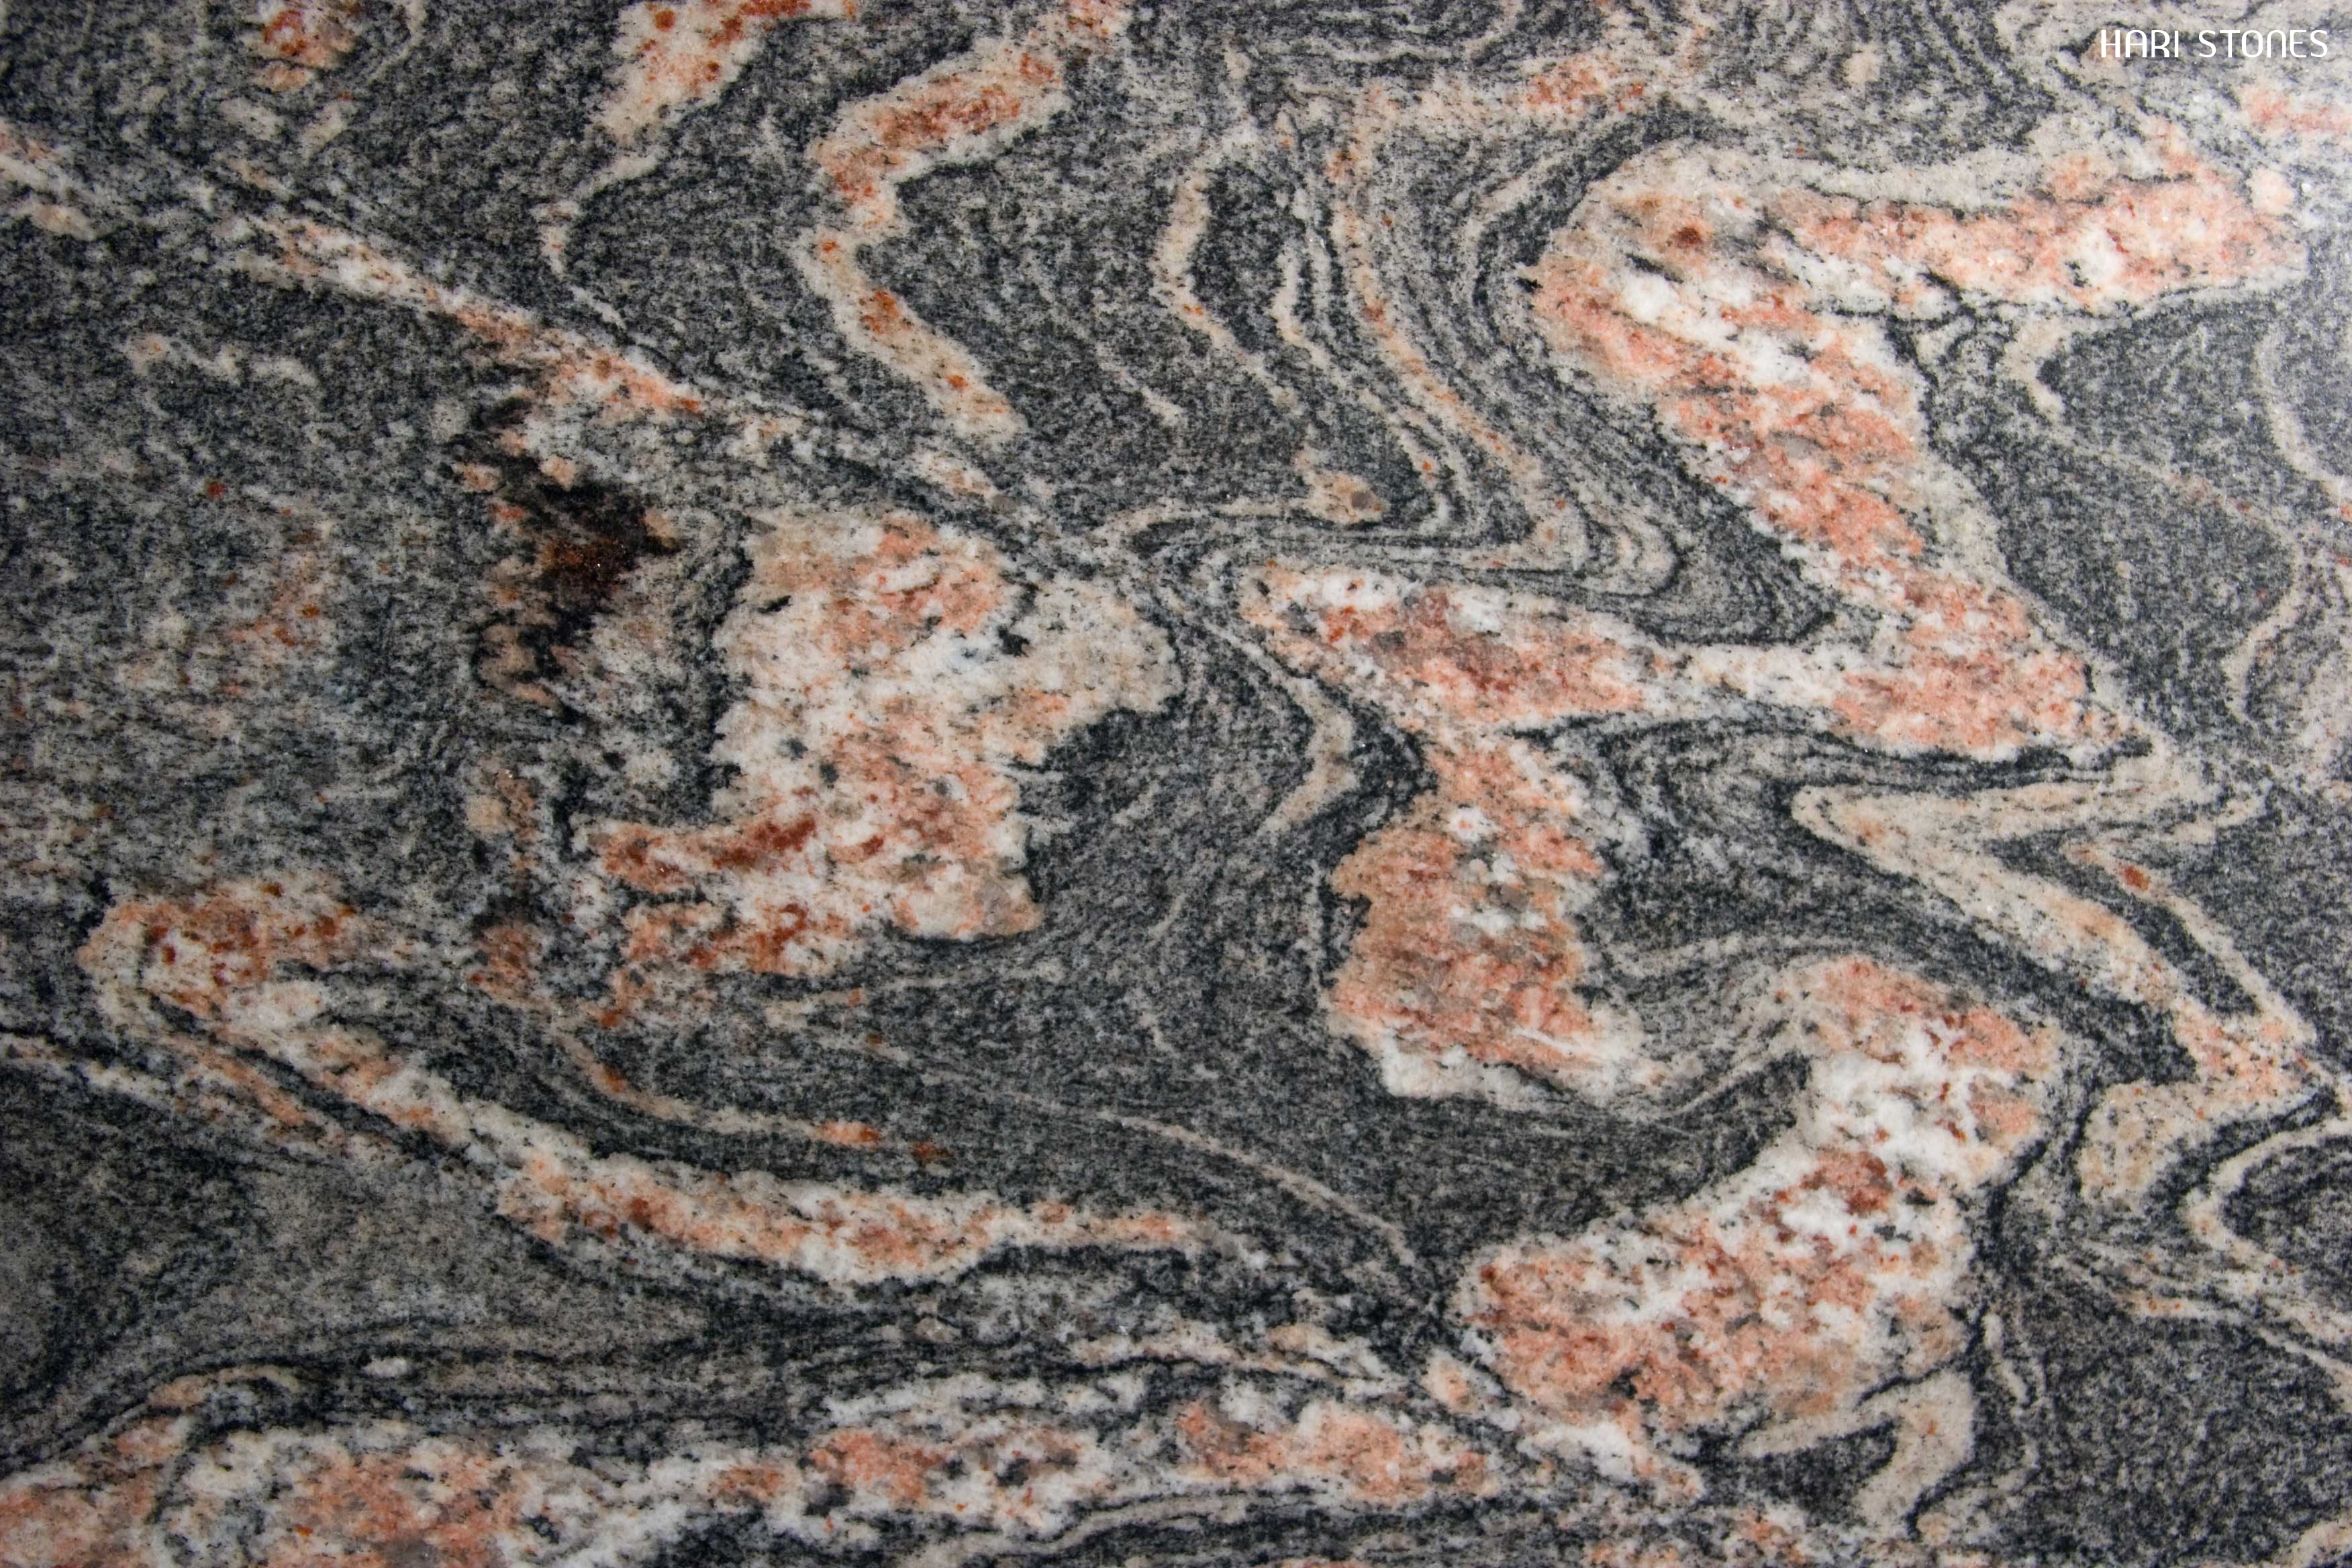 Tropical Bahia Granite Slabs Suppliers and Distributors